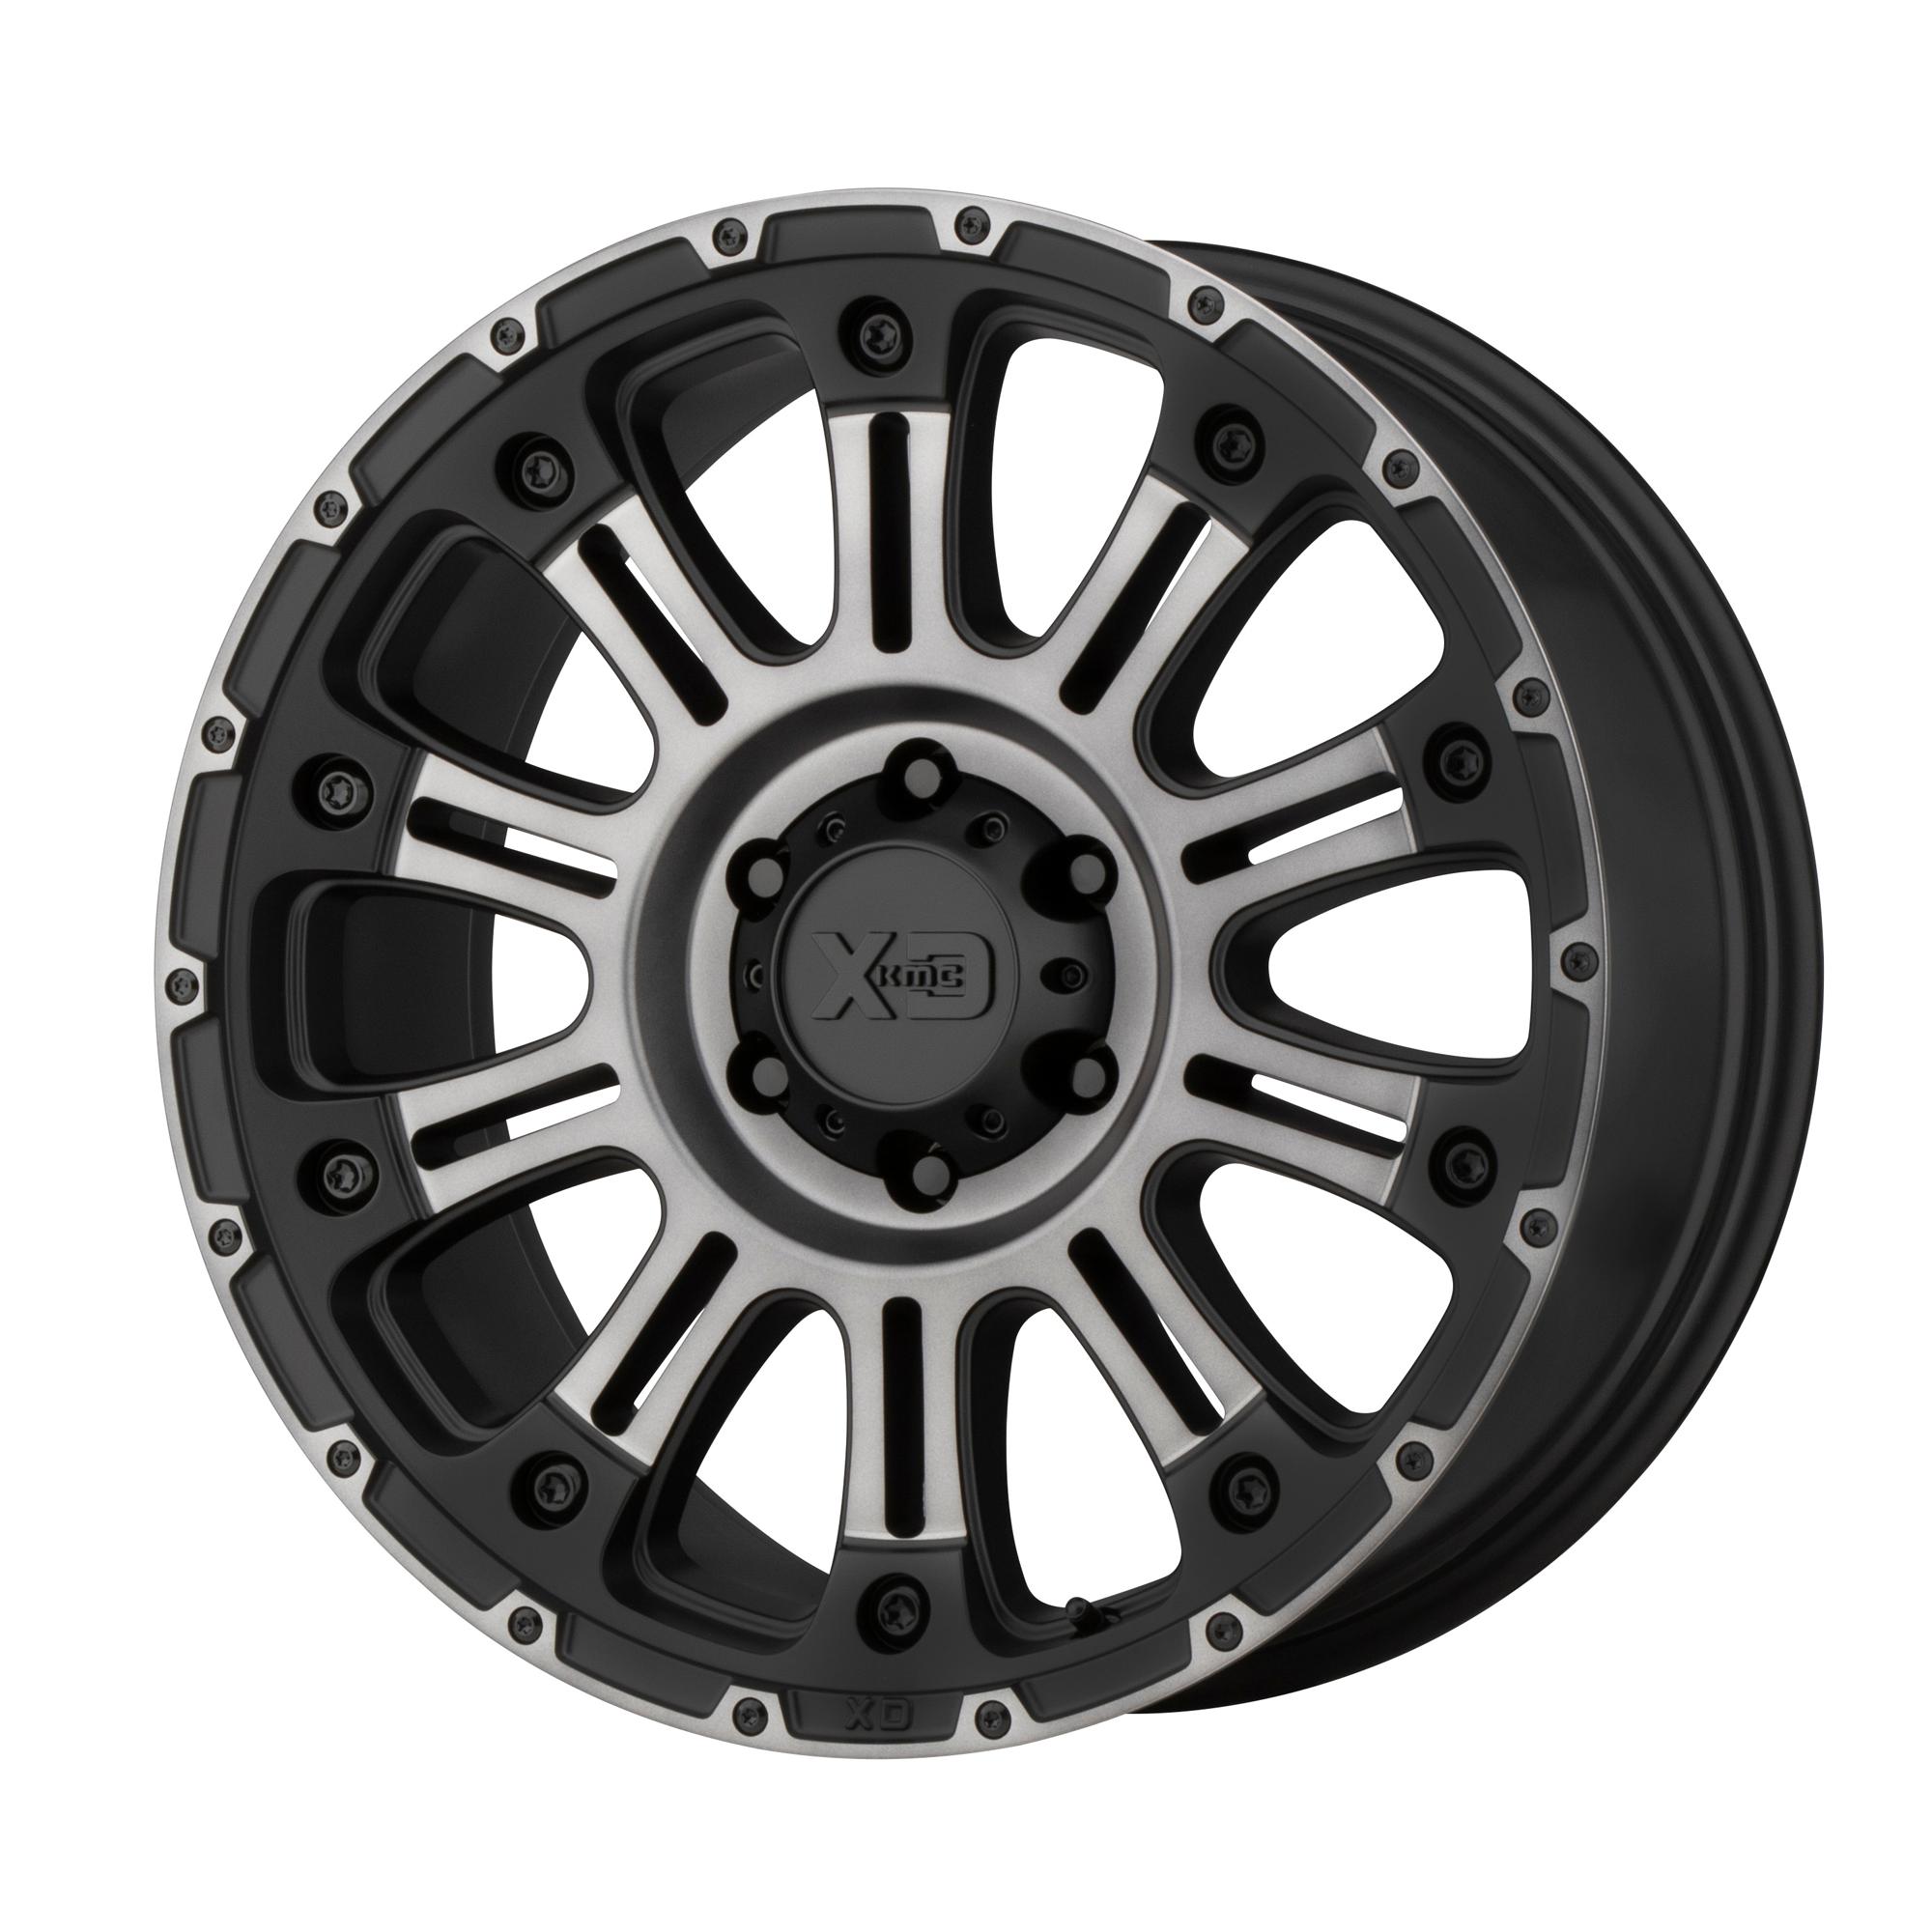 XD SERIES XD829 HOSS II hliníkové disky 9x18 8x165,1 ET0 Satin Black Machined Gray Tint